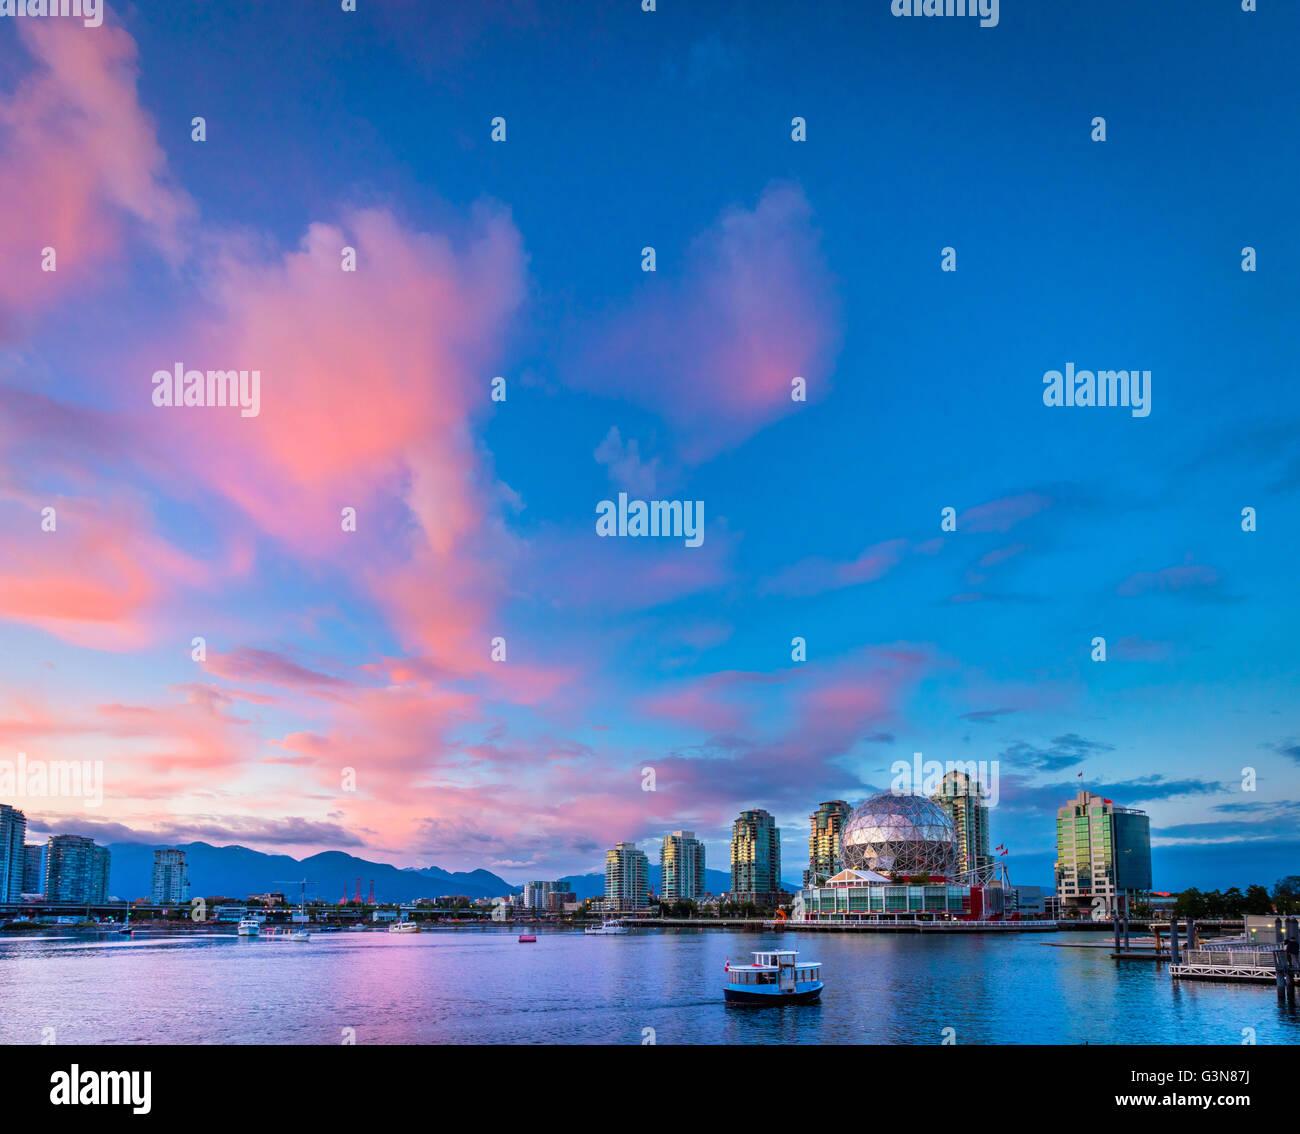 Welt der Wissenschaft bei Telus World of Science, Vancouver Stockbild